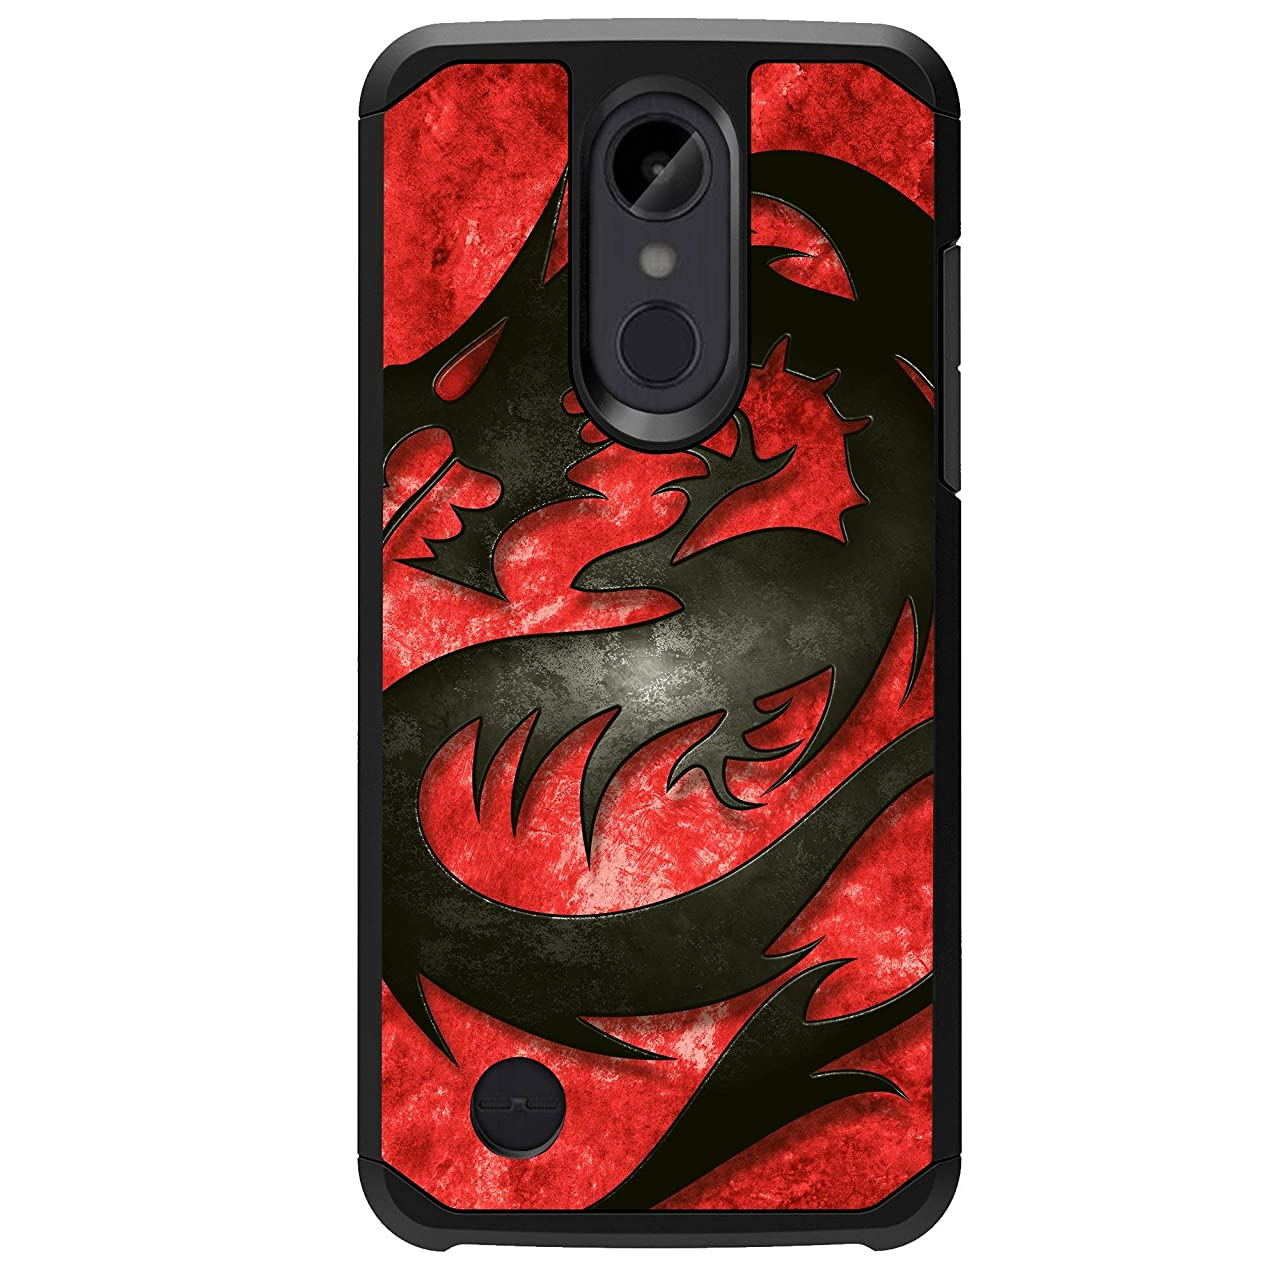 MINITURTLE Case Compatible LG Rebel 2, LG Phoenix 3, LG Fortune, LG Risio 2 Case[Impact Resistant Silicone Interior][Slim][2-Part Protection] - Red Dragon